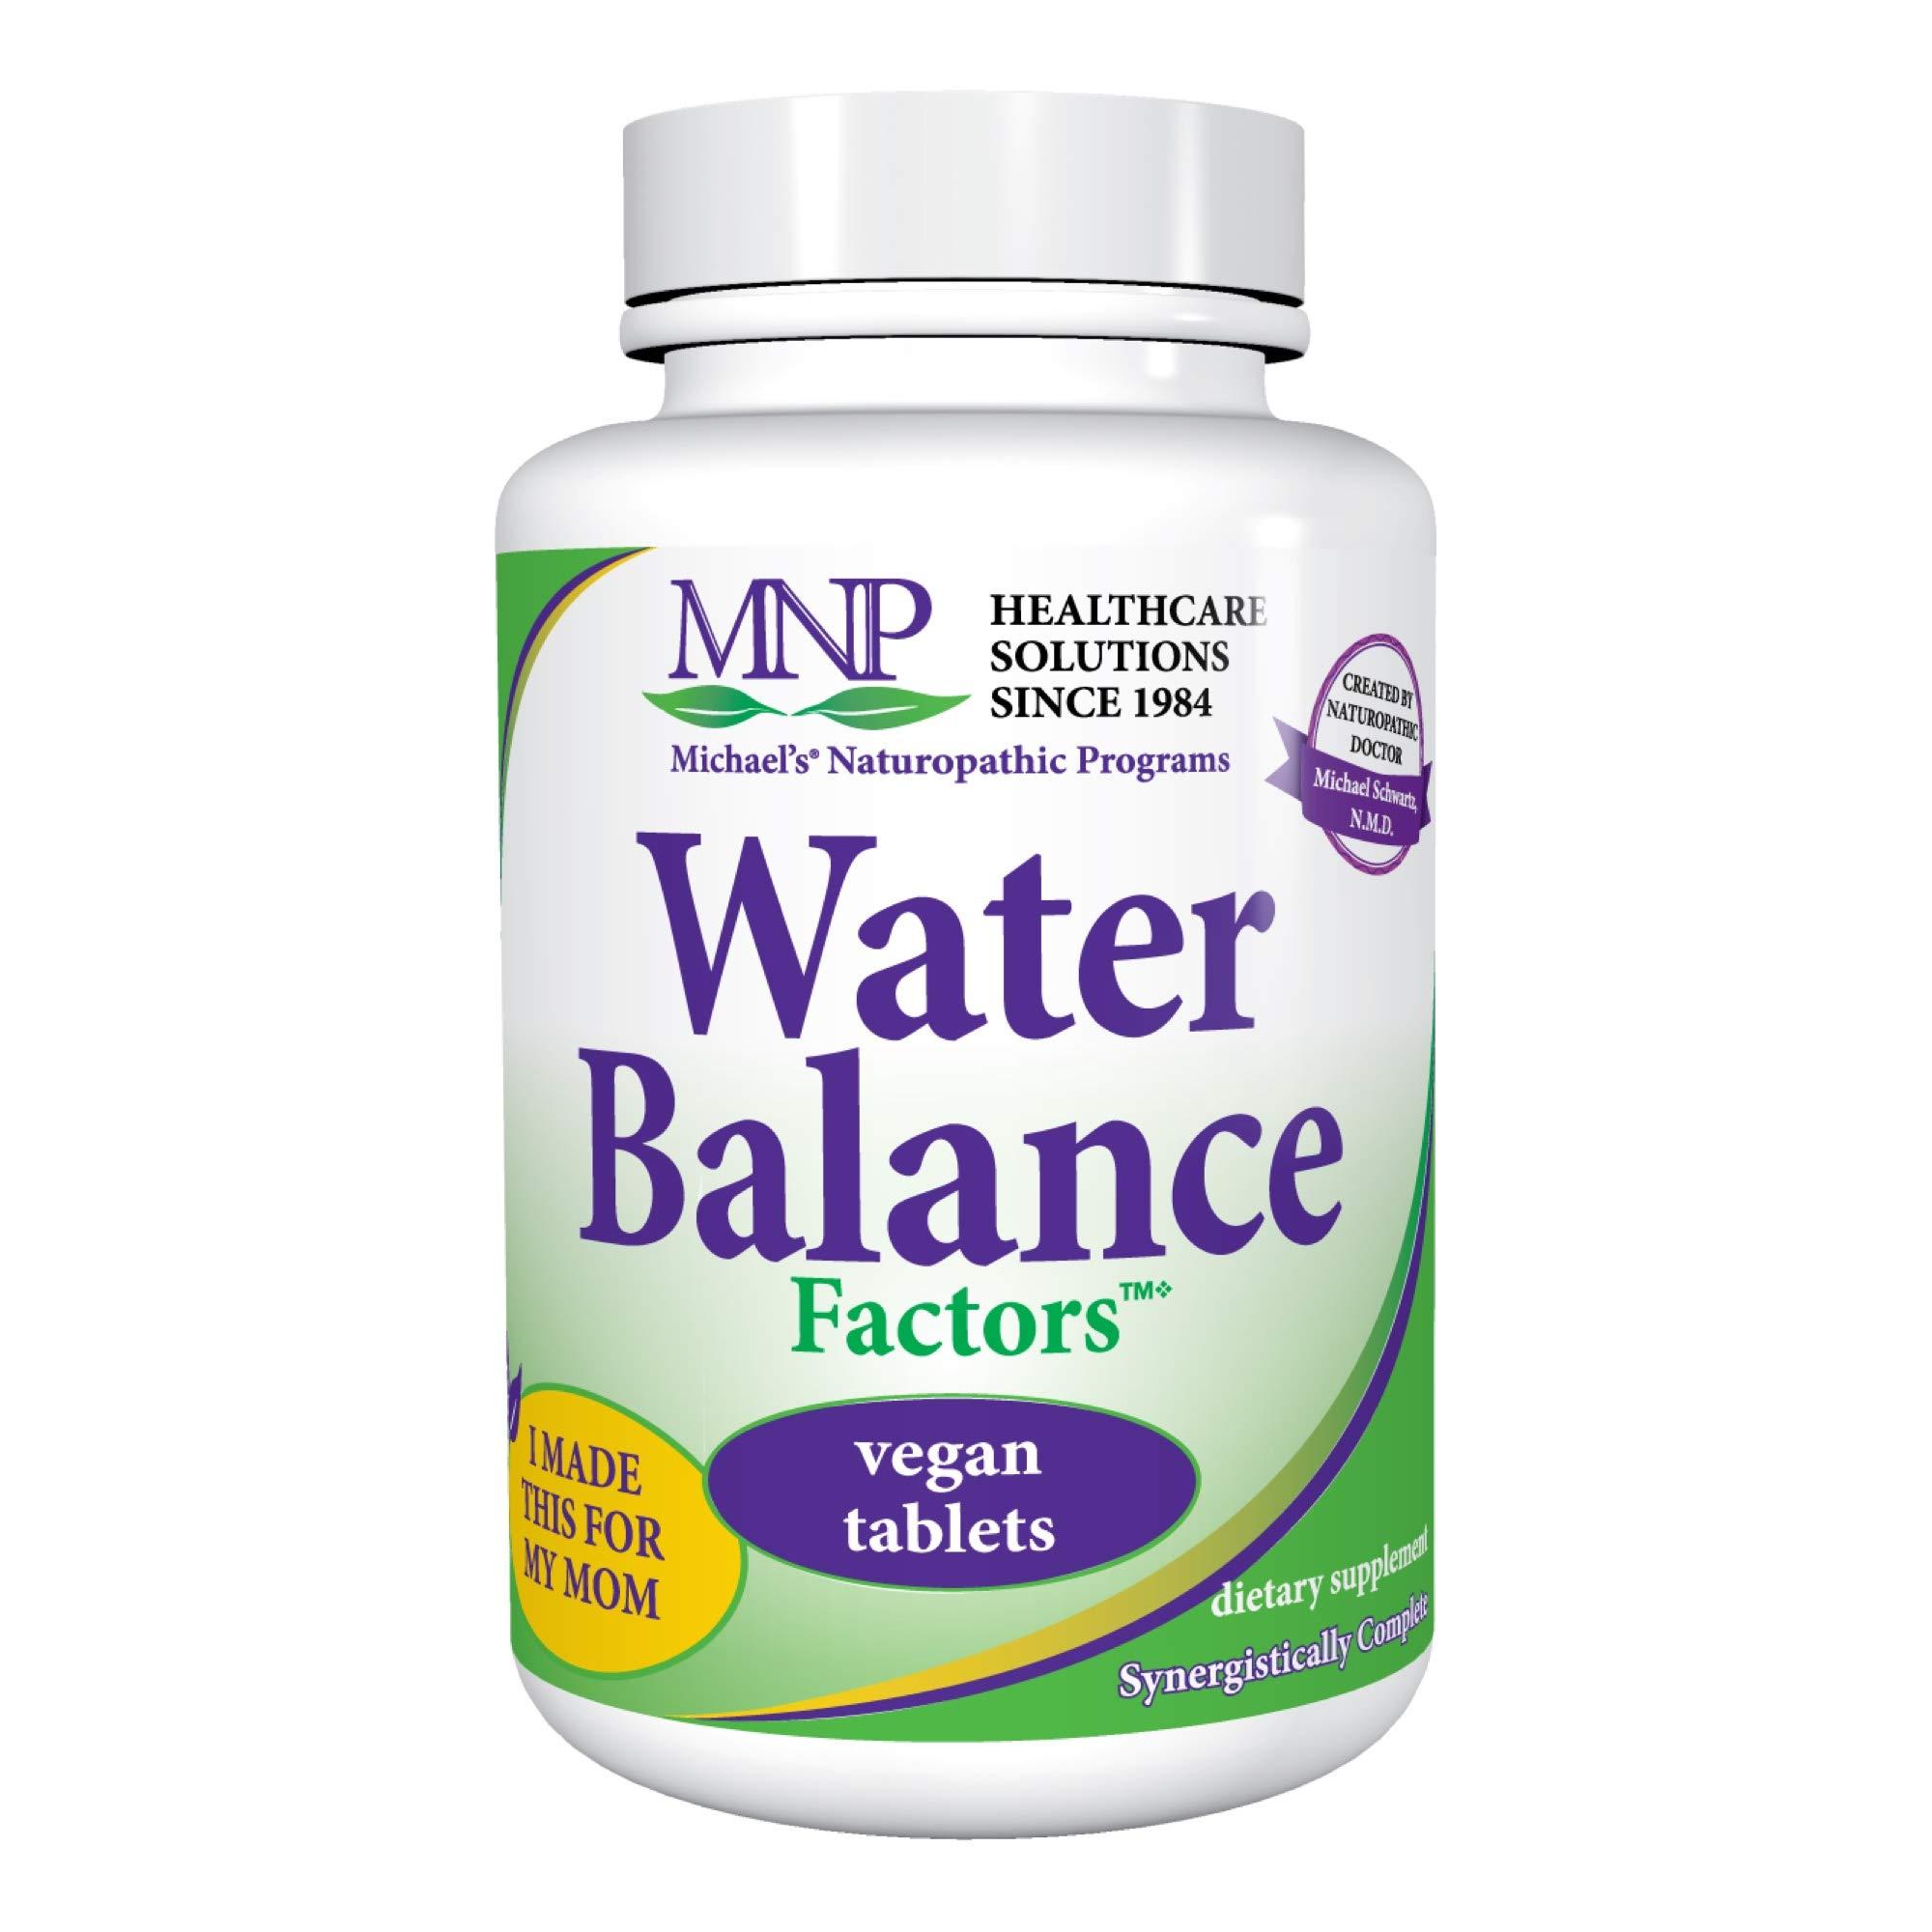 Michael's Naturopathic Programs Water Balance Factors - 90 Vegan Tablets - Fluid Balance Support Supplement, Weight Management Aid - Gluten Free, Kosher - 30 Servings